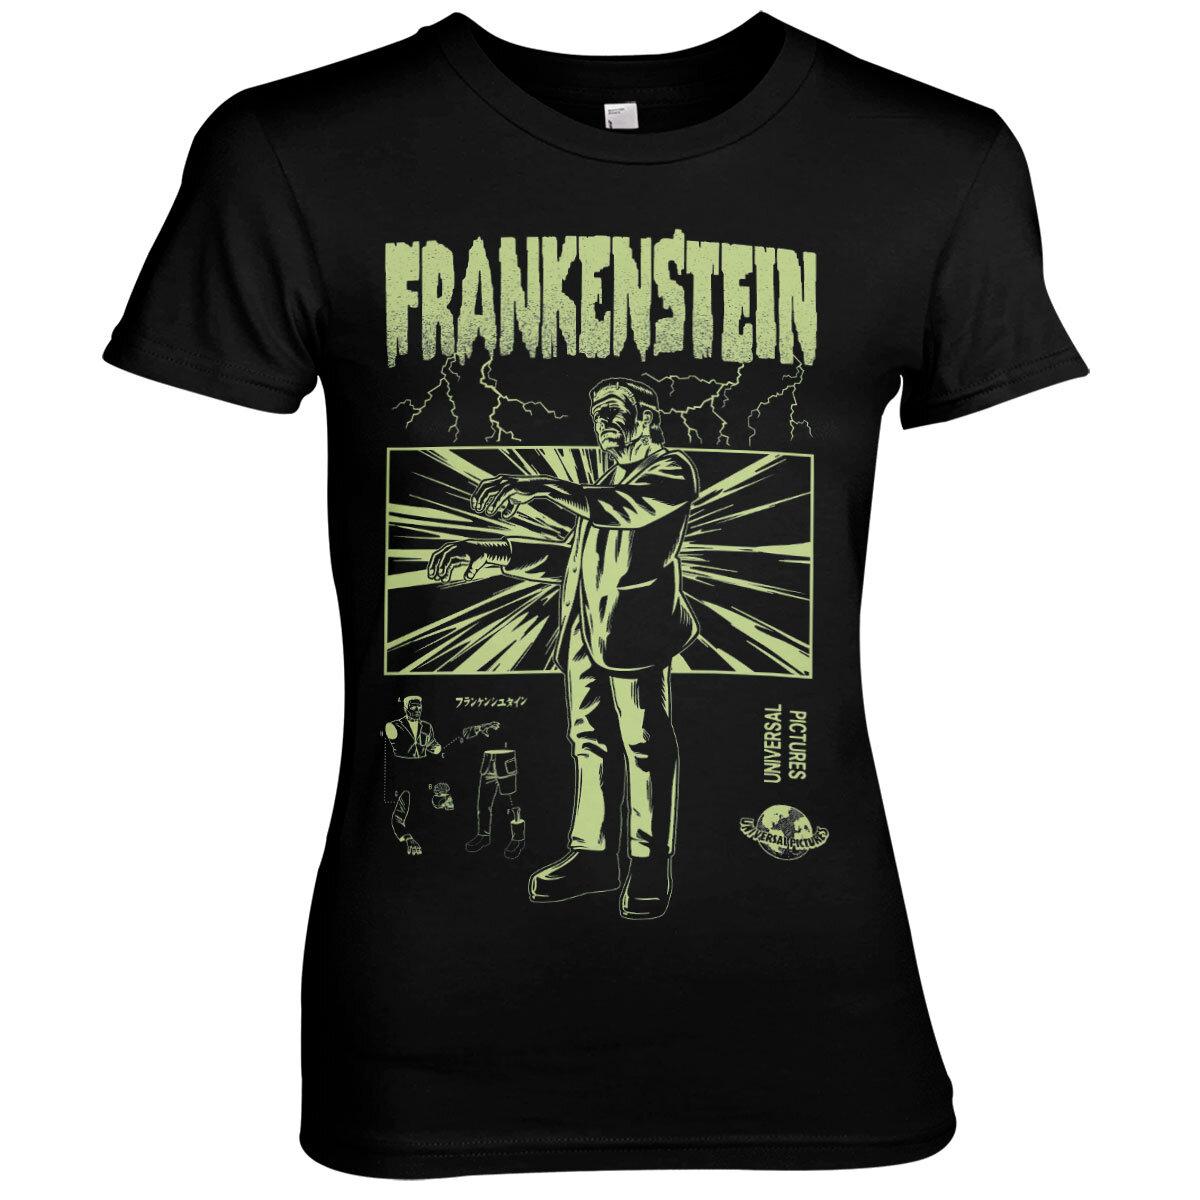 Frankenstein Retro Girly Tee